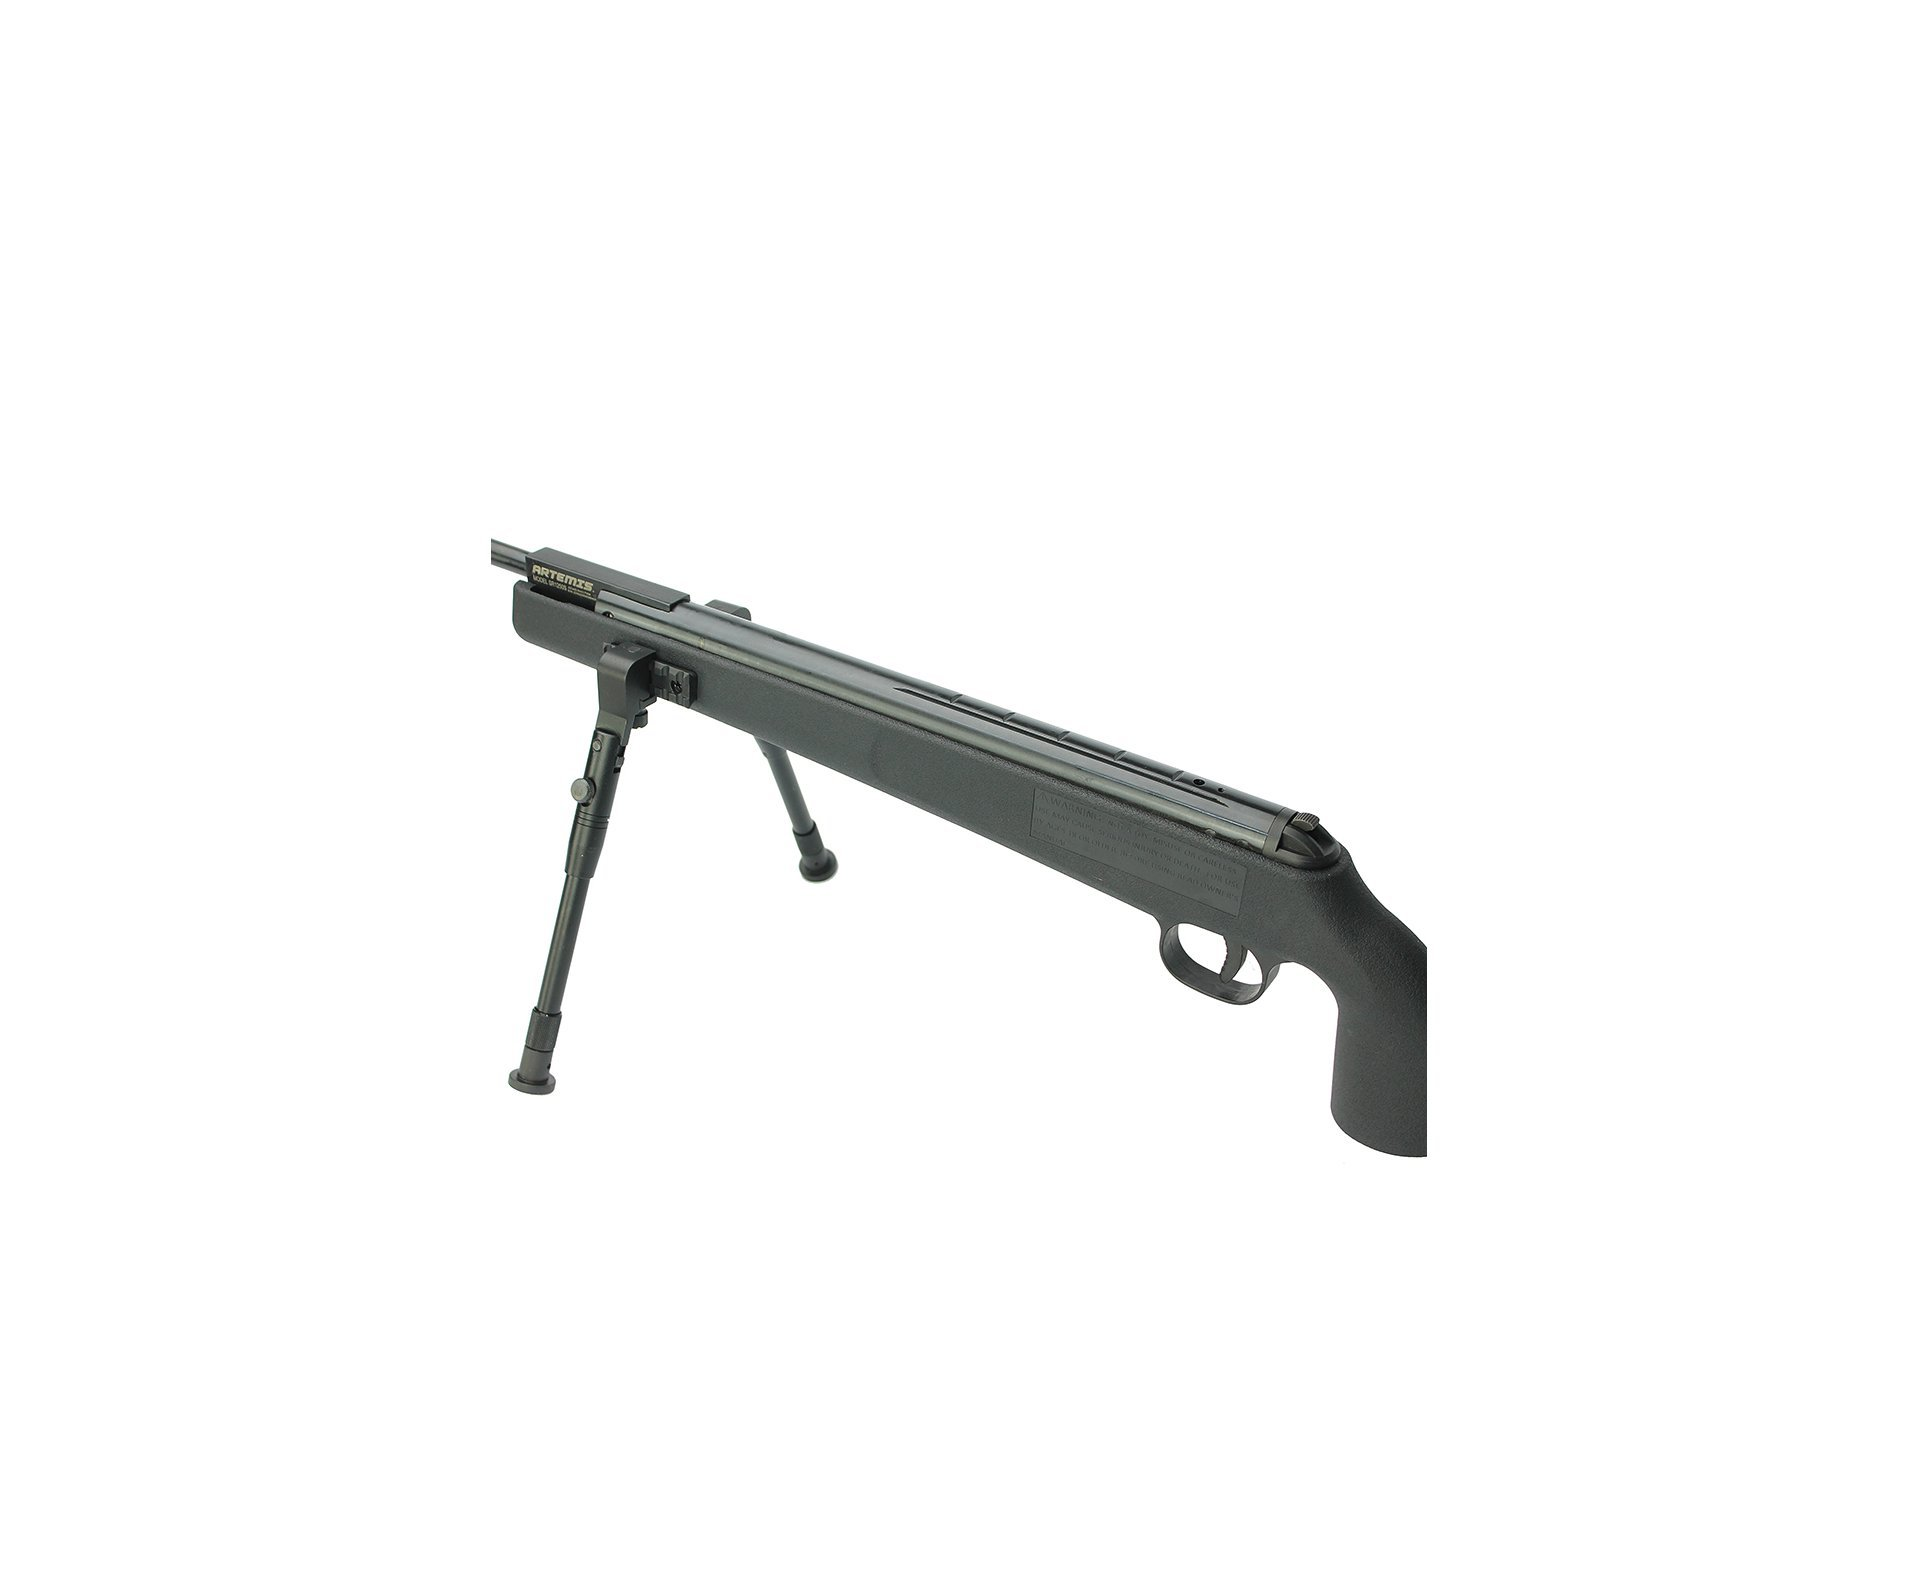 Carabina De Pressão Artemis Gp 1250 Sniper Gas Ram 70kg Black 5,5mm